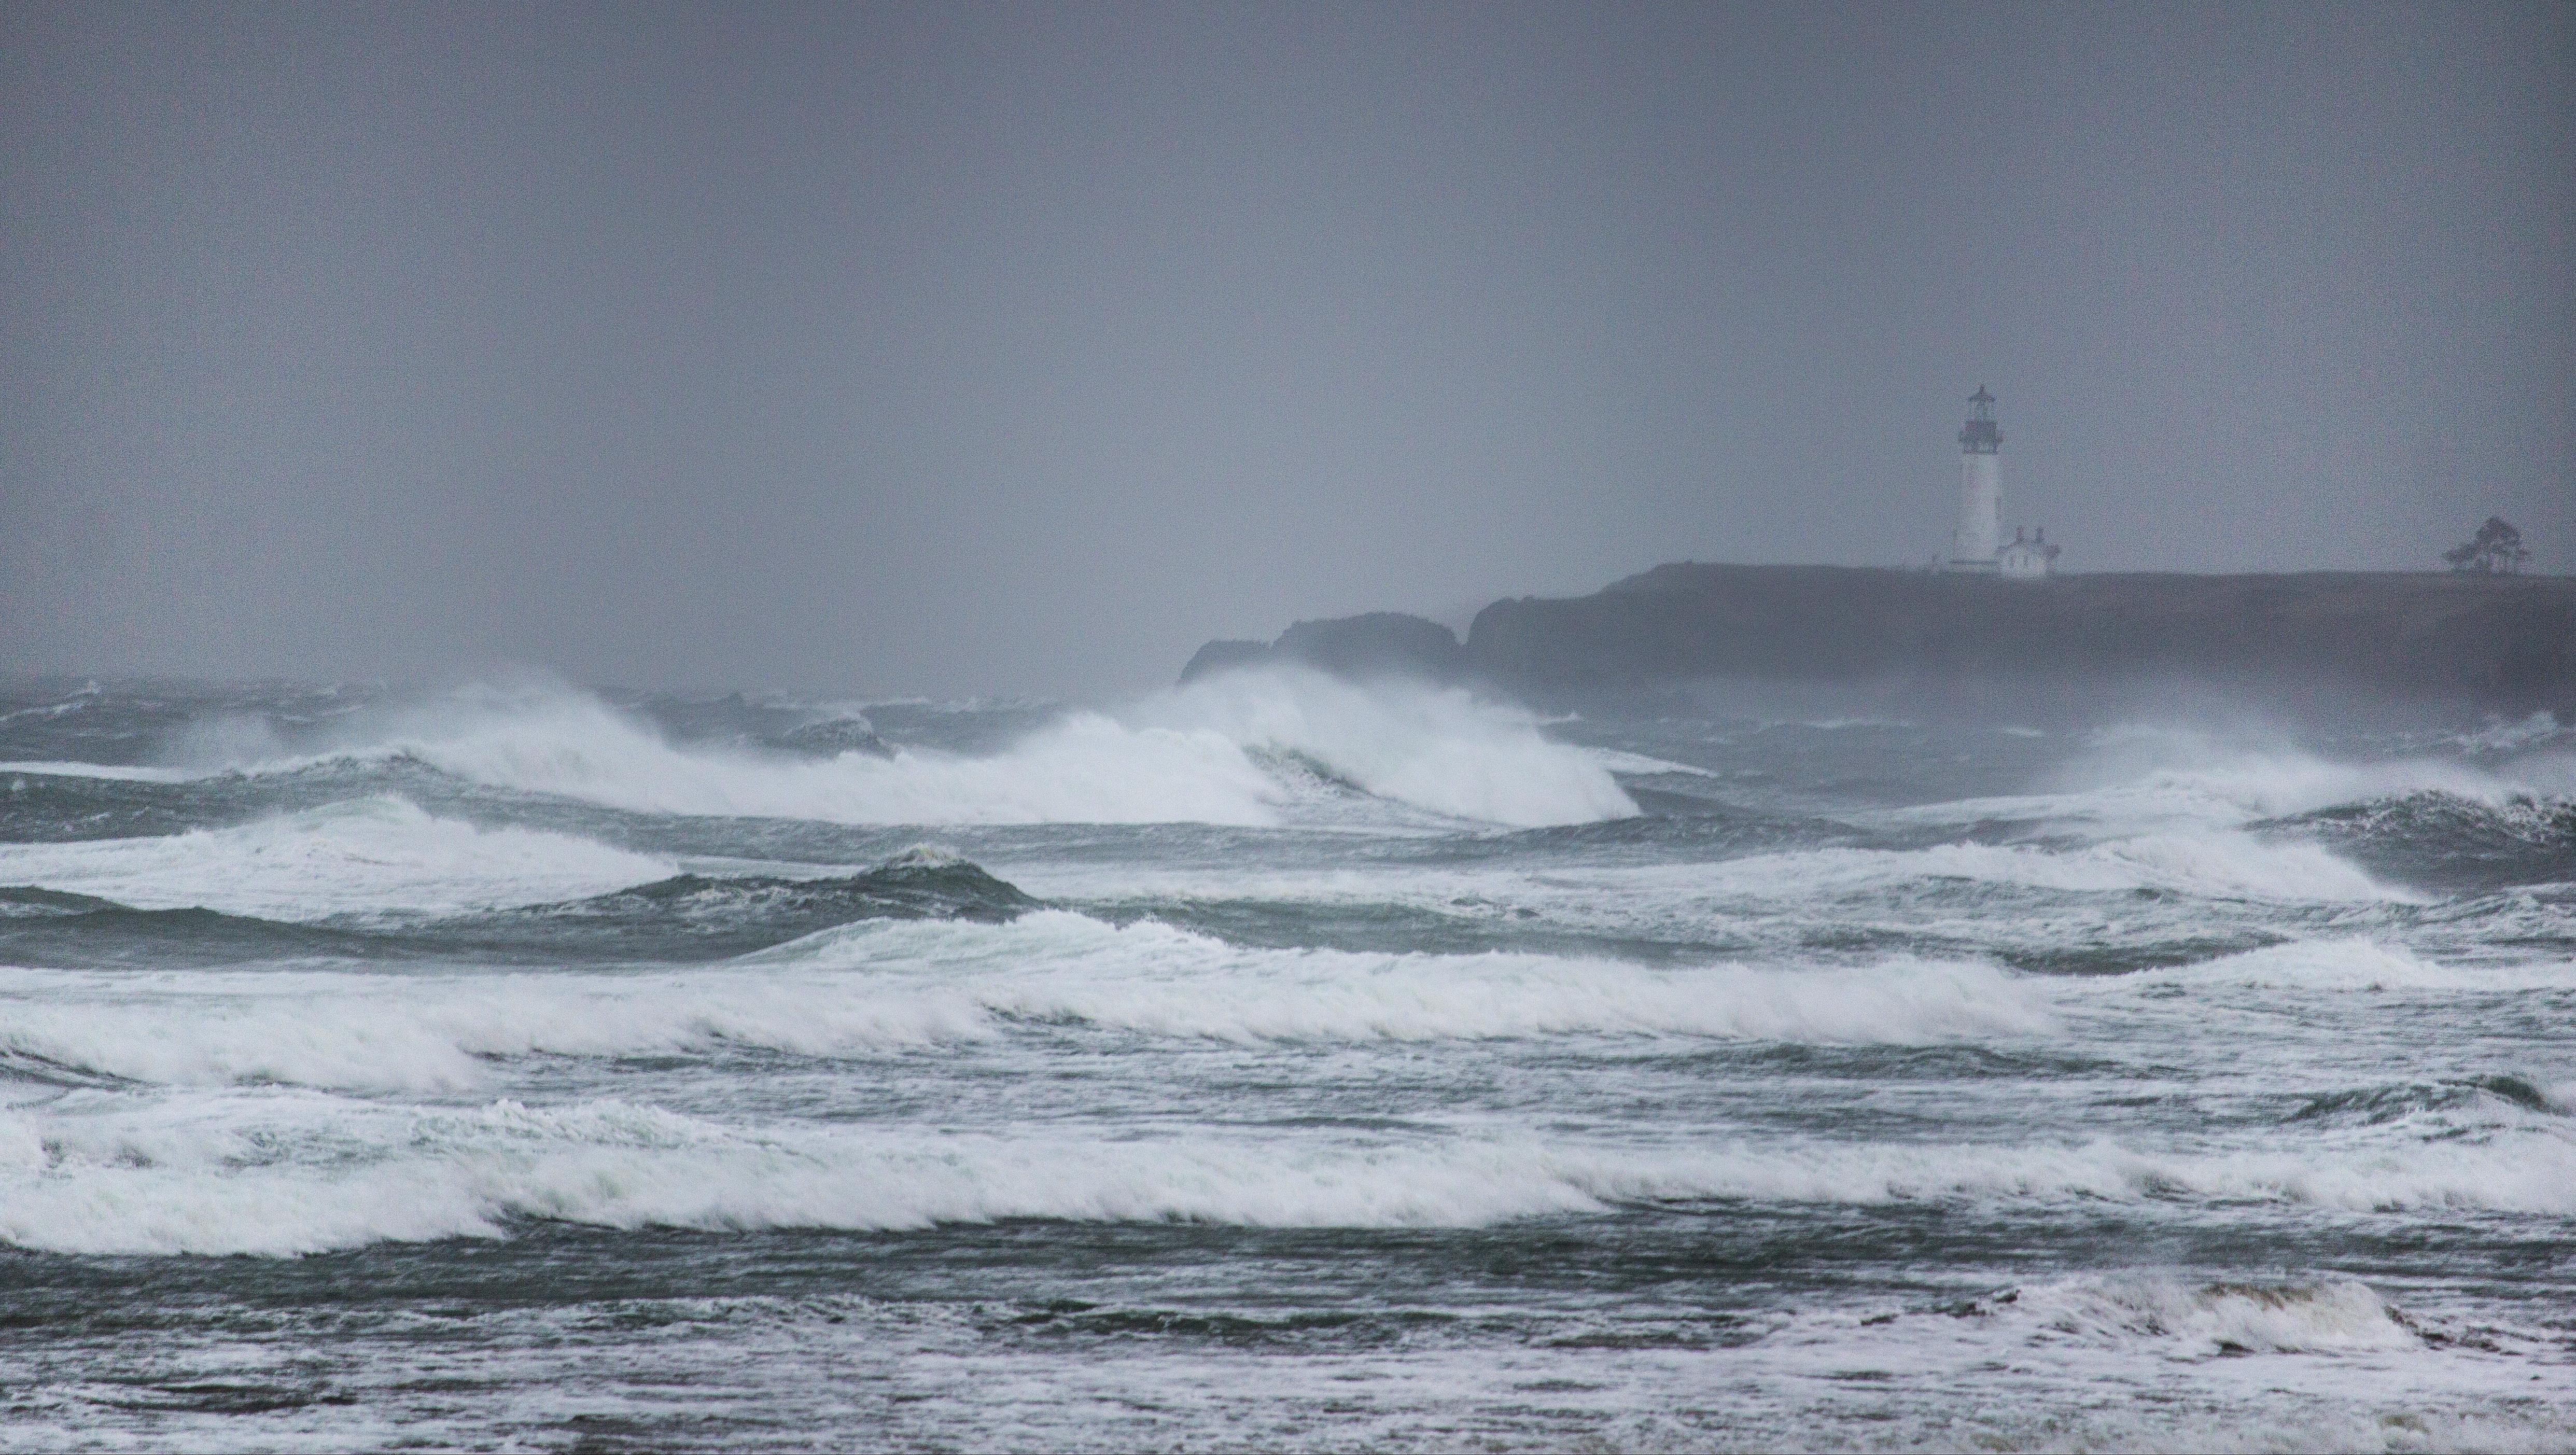 Yaquina lighthouse winter storm, Oregon, Bay, Coast, Lighthouse, Mountain, HQ Photo